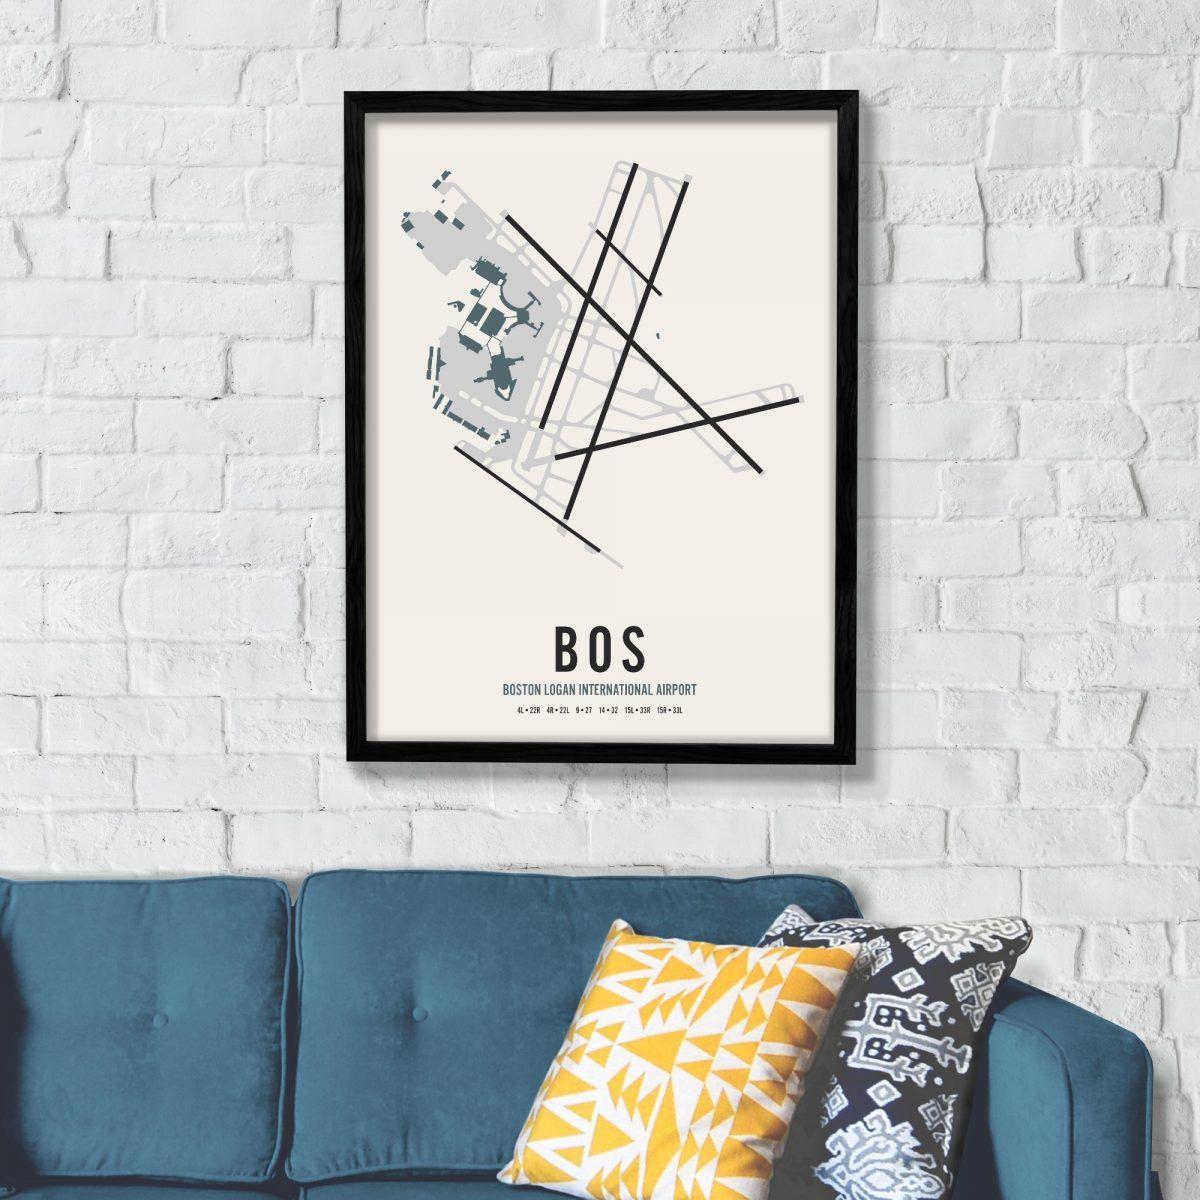 Boston Logan Airport Map Products you tagged Logan